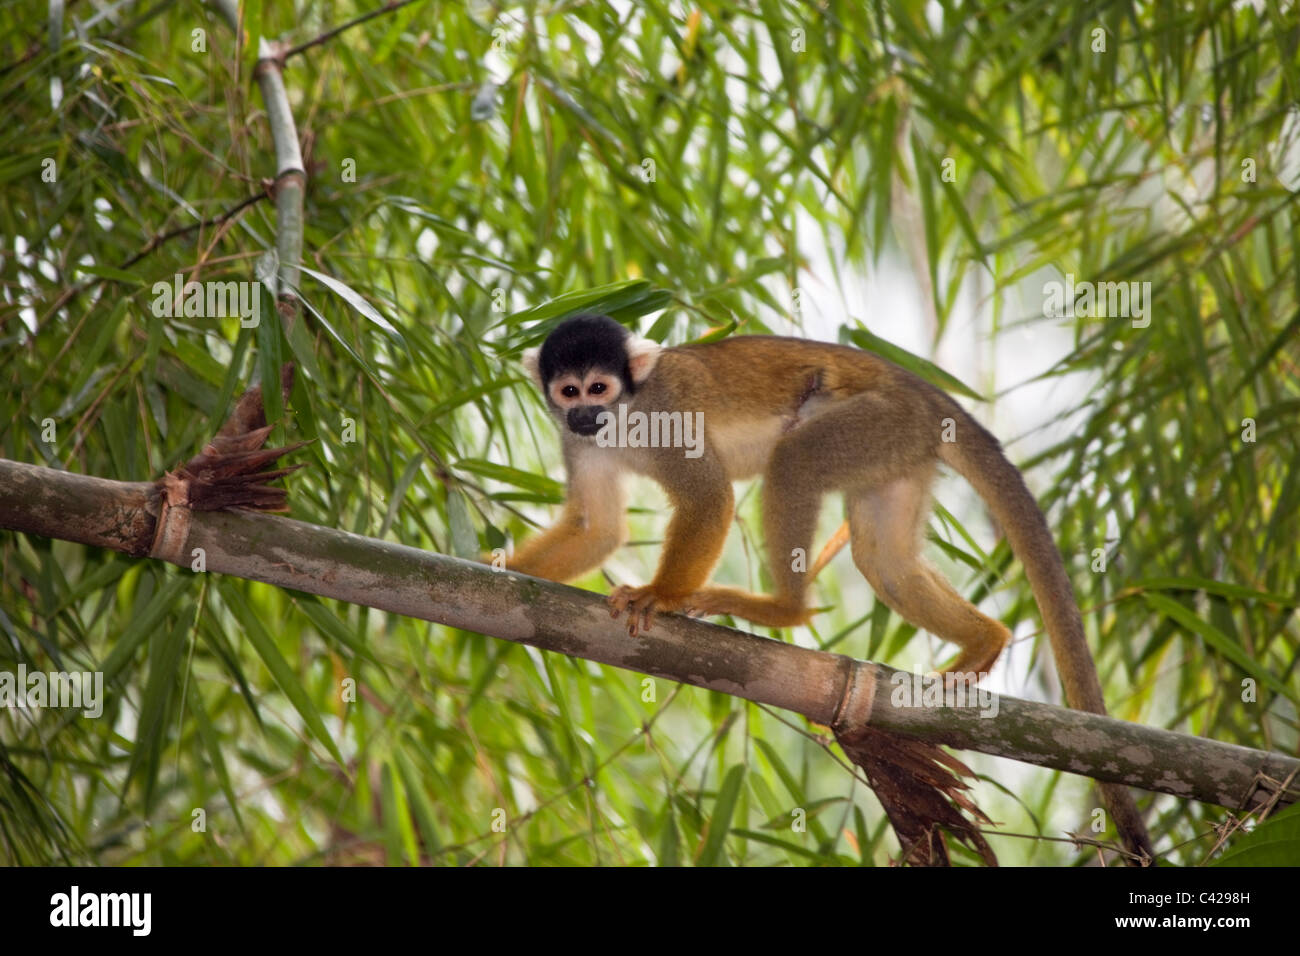 Peru, Boca Manu, Blanquillo, Manu National Park, UNESCO World Heritage Site, Common Squirrel Monkey ( Saimiri sciureus ). Stock Photo